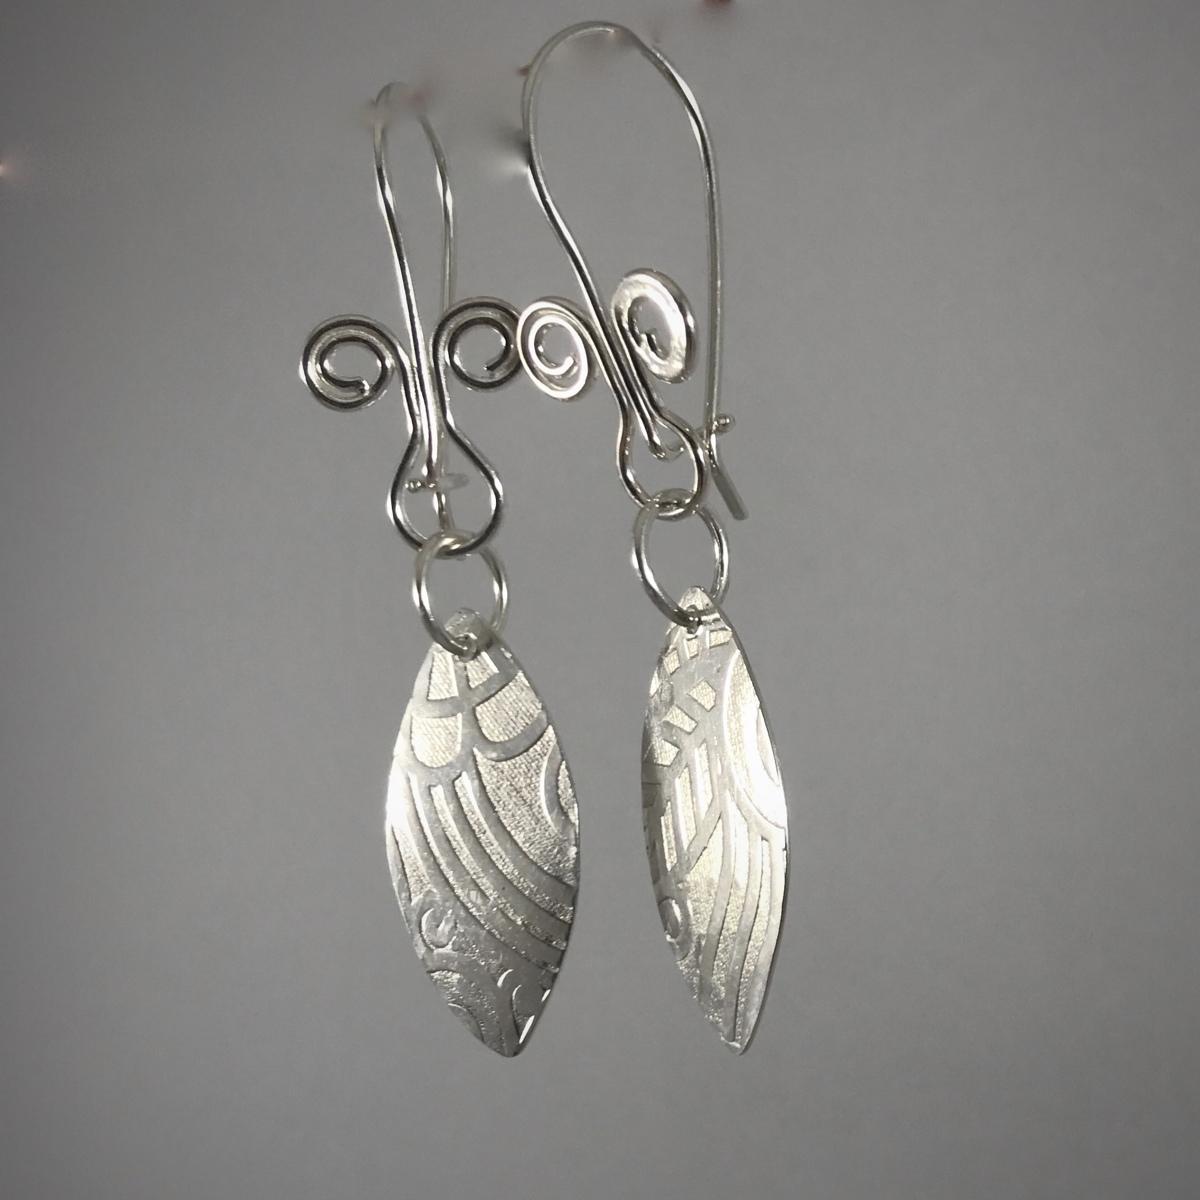 Kinetic Patterned Silver Leaf Drop Earrings90 (large view)